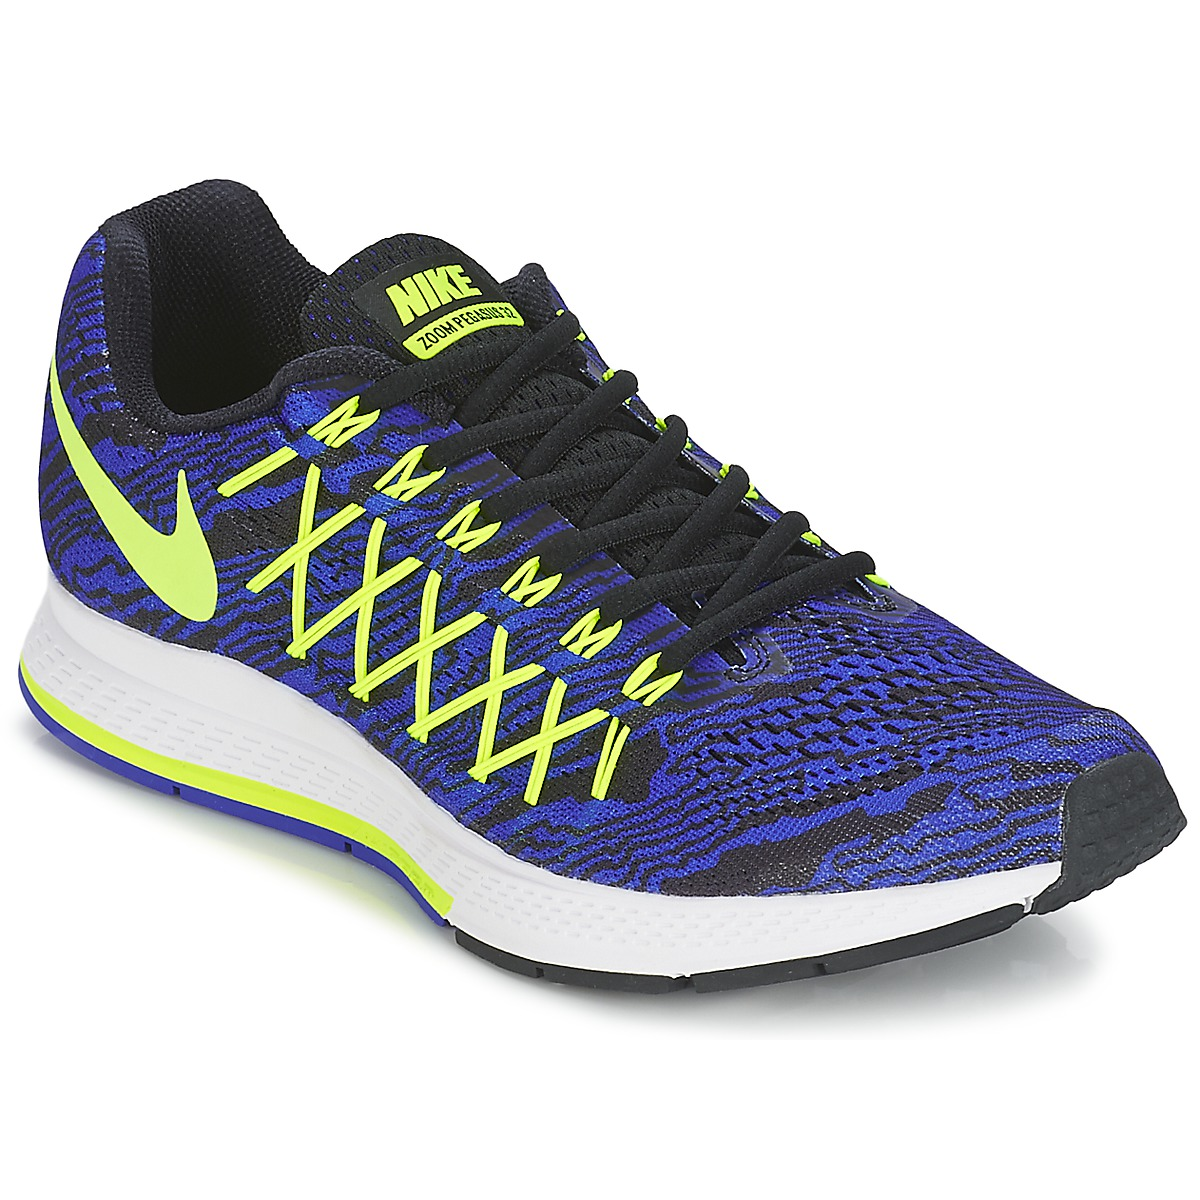 Chaussures-de-running Nike AIR ZOOM PEGASUS 32 PRINT Bleu